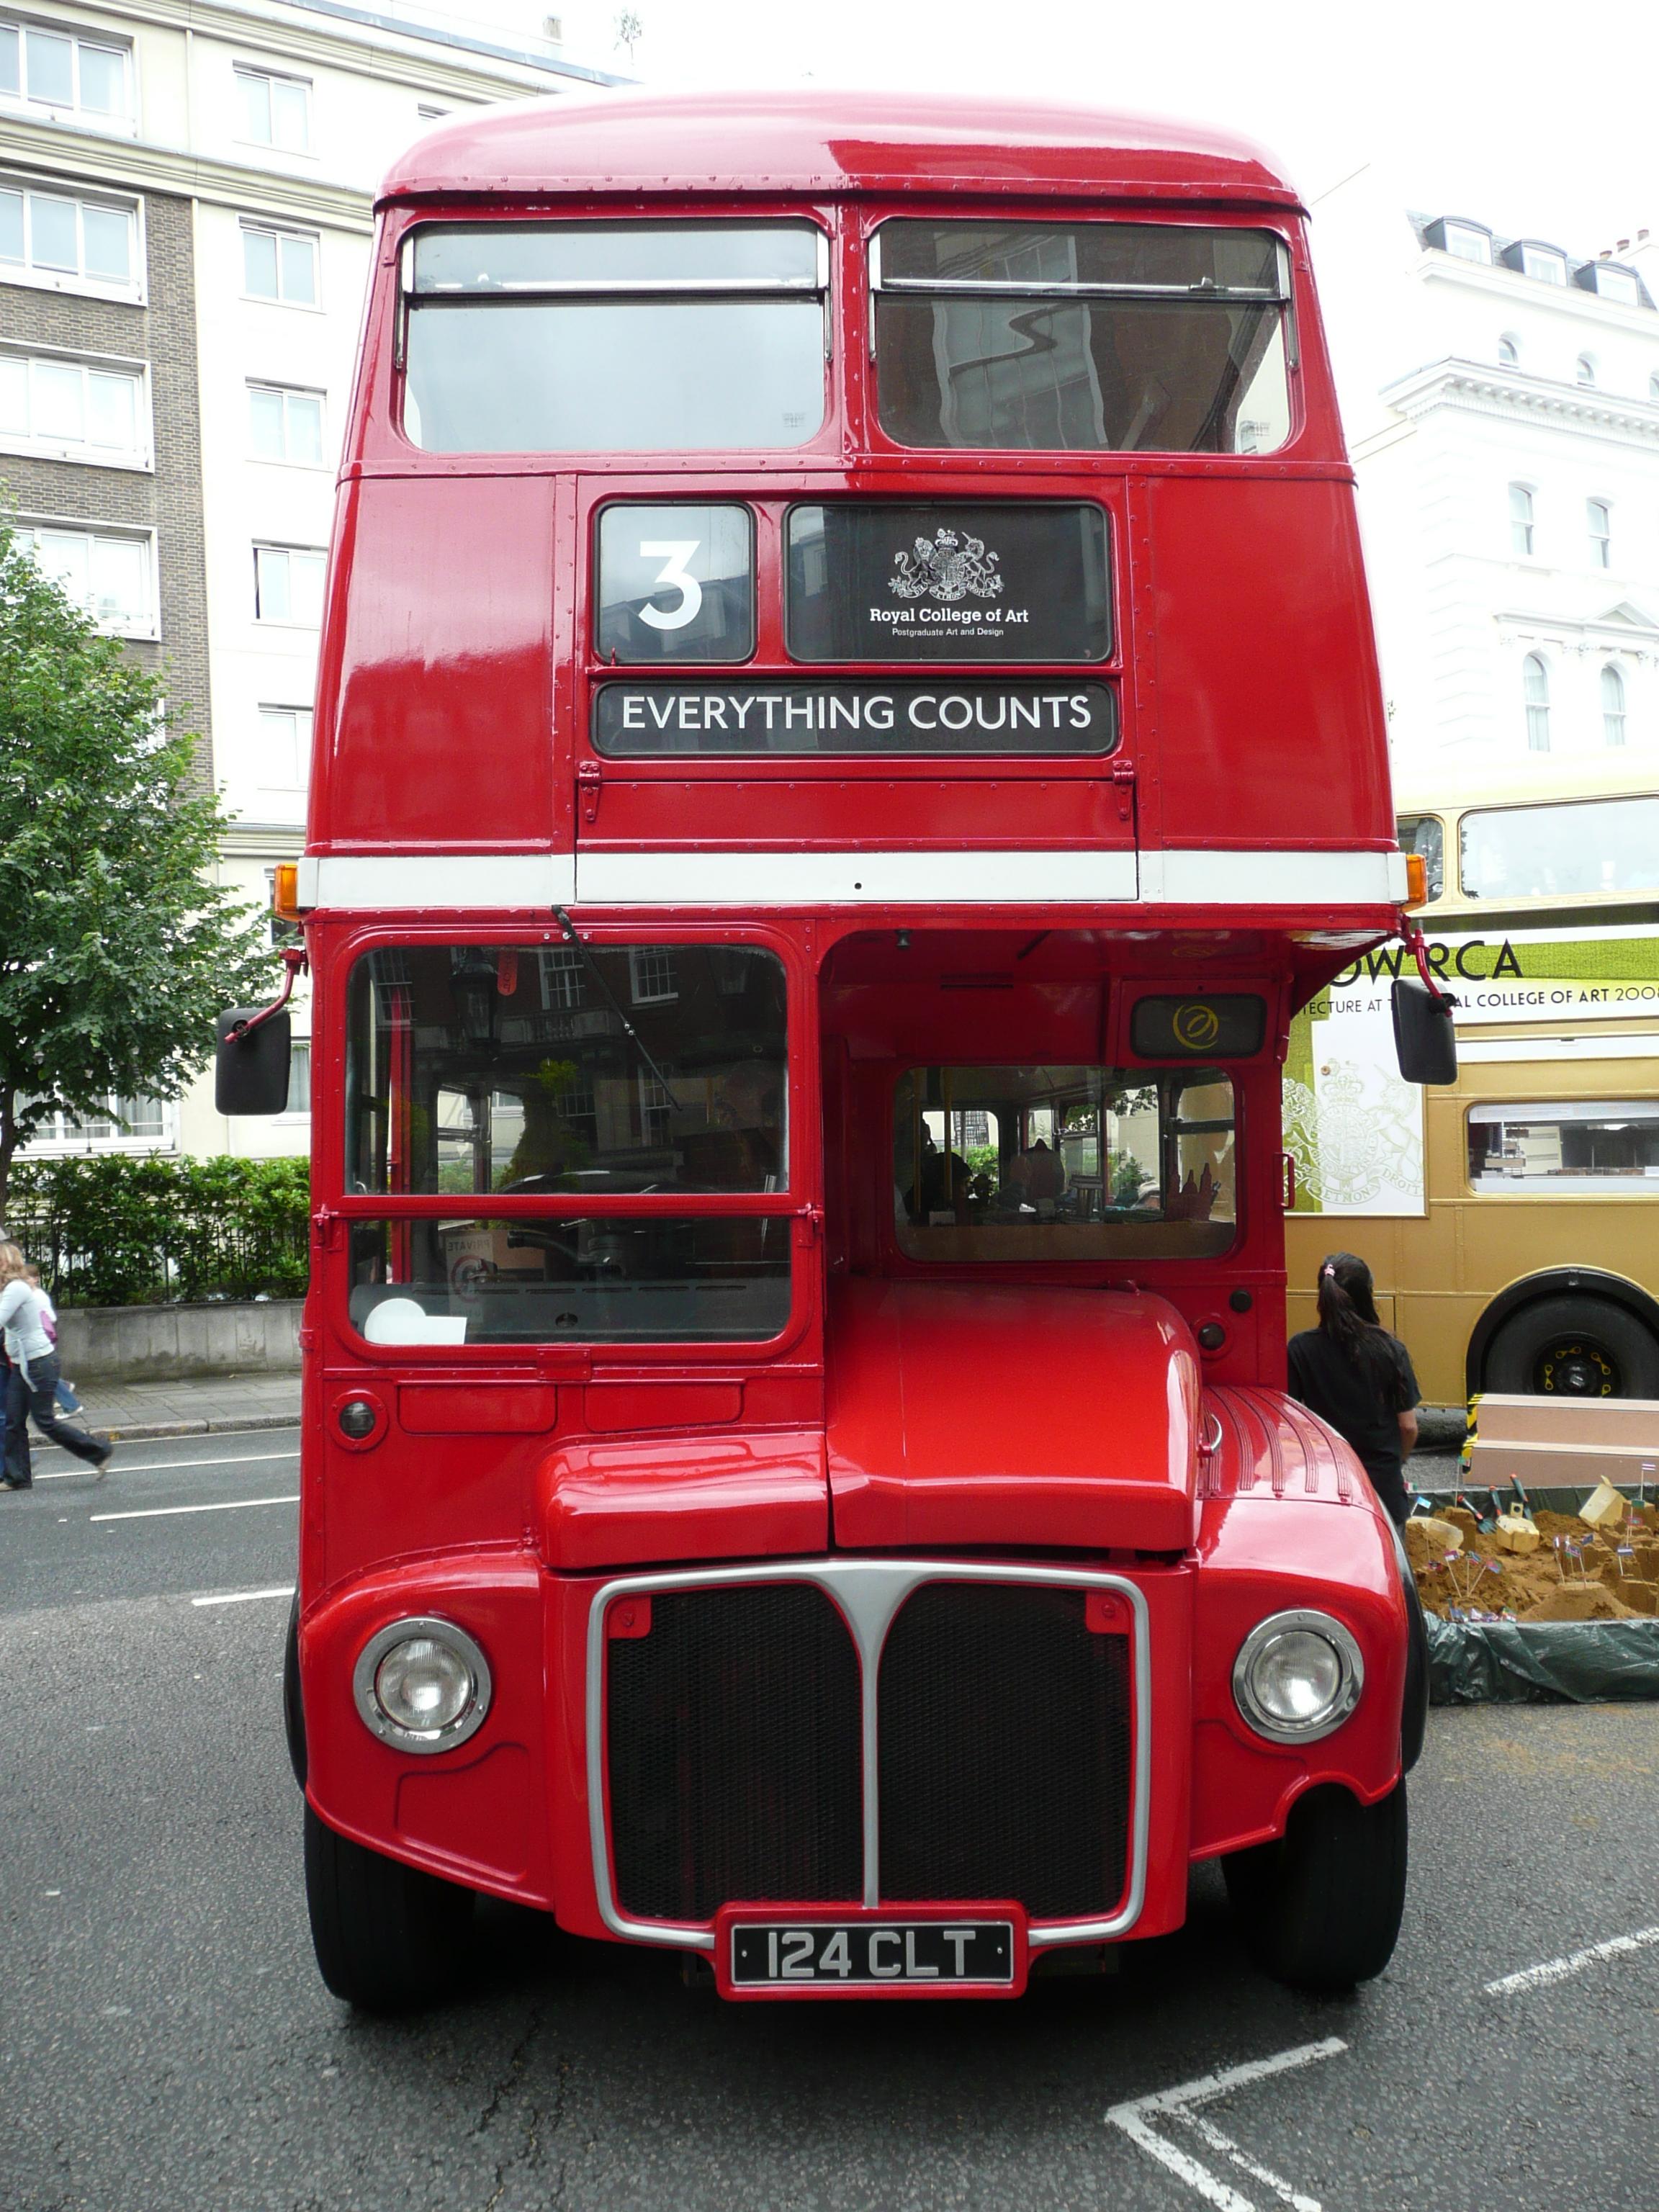 File Arriva London Routemaster Bus Rm1124 124 Clt